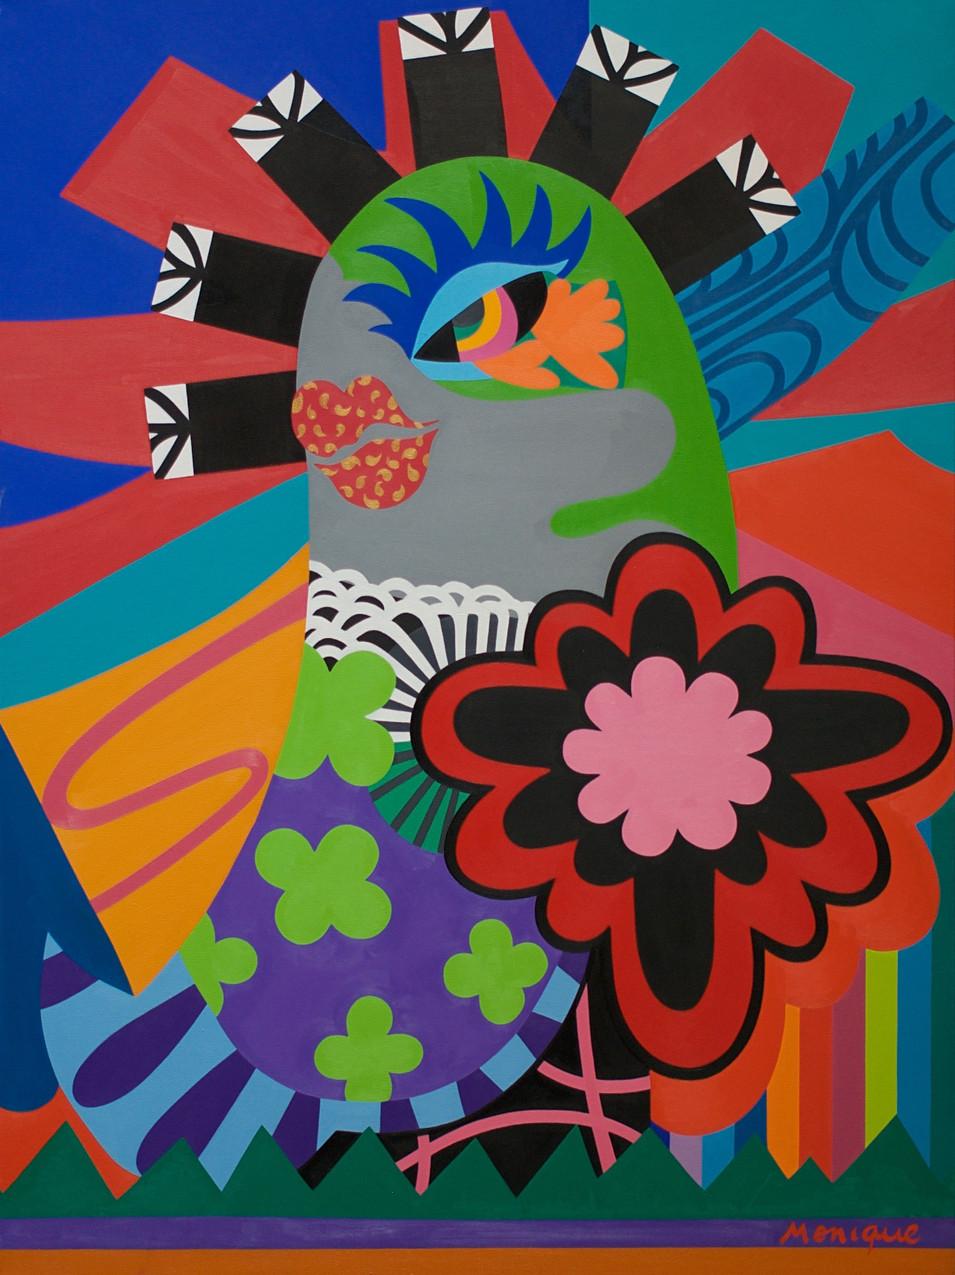 LA LUJURIOSA (The lustful parrot)